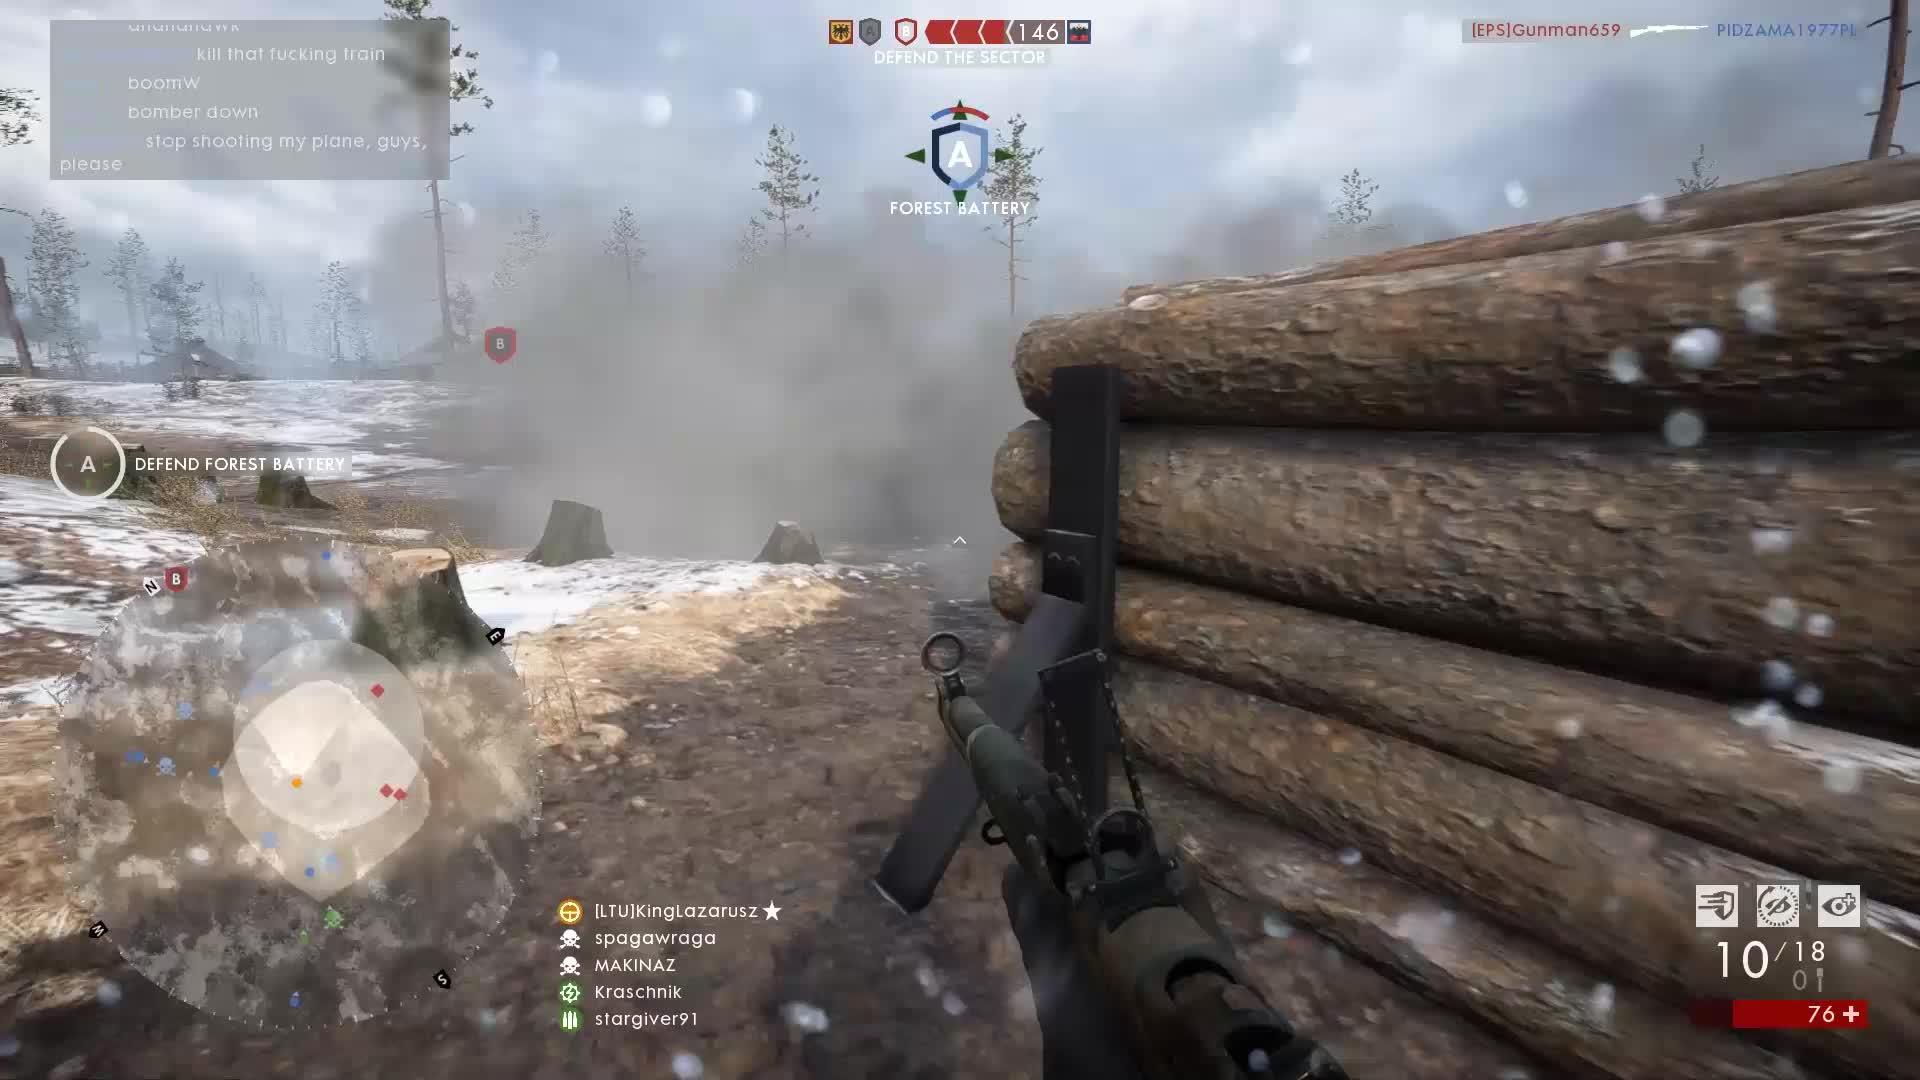 battlefield 1, Refuse to lose GIFs